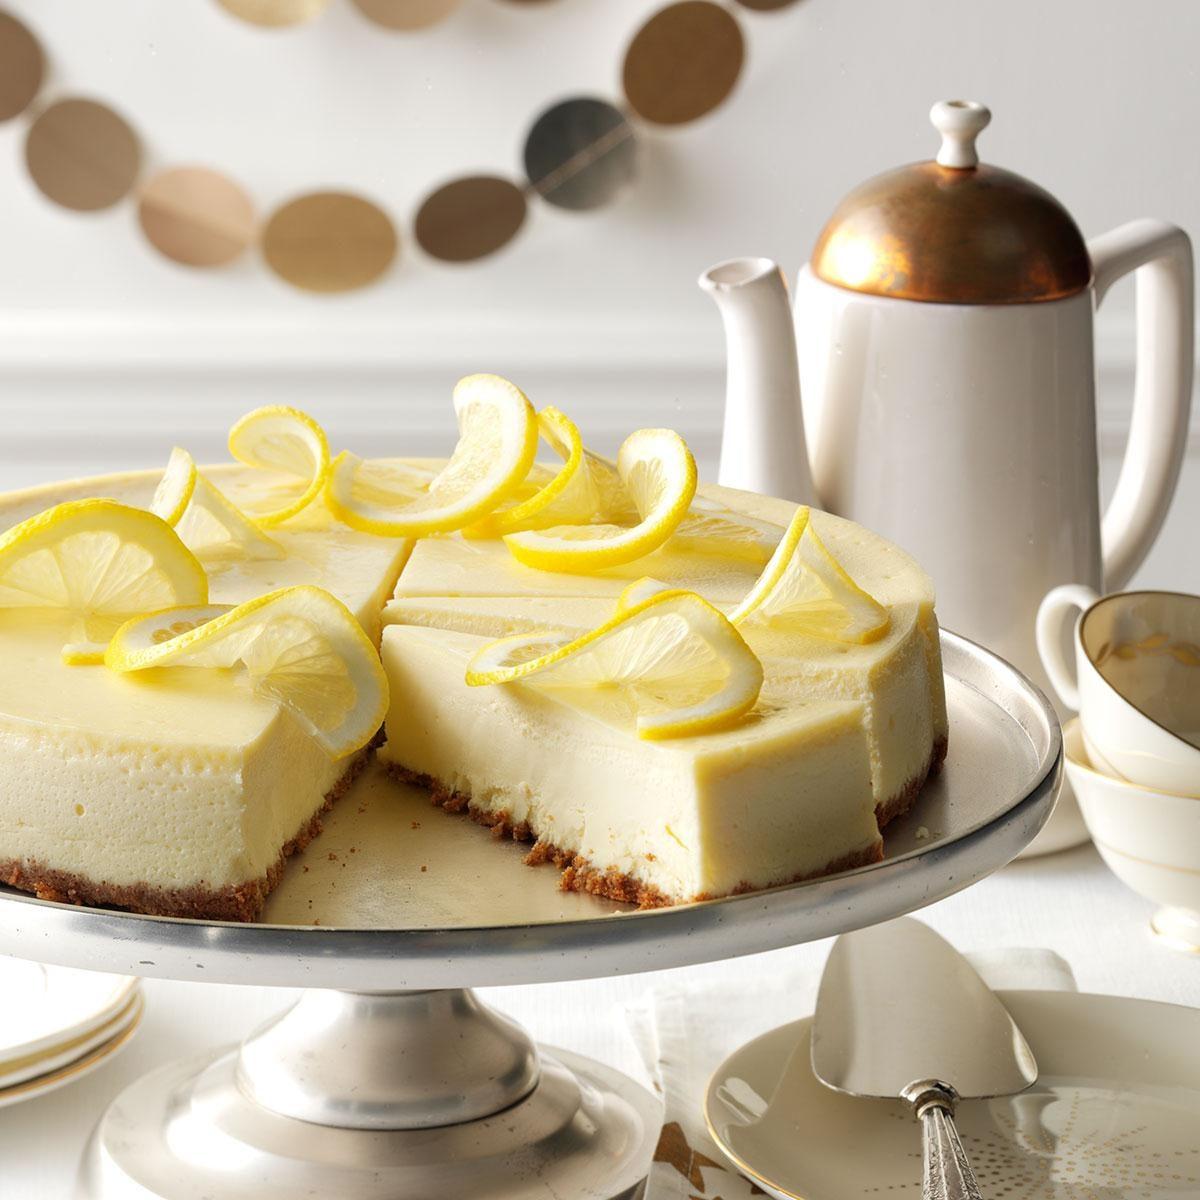 25 Creamy Lemon Desserts We Love